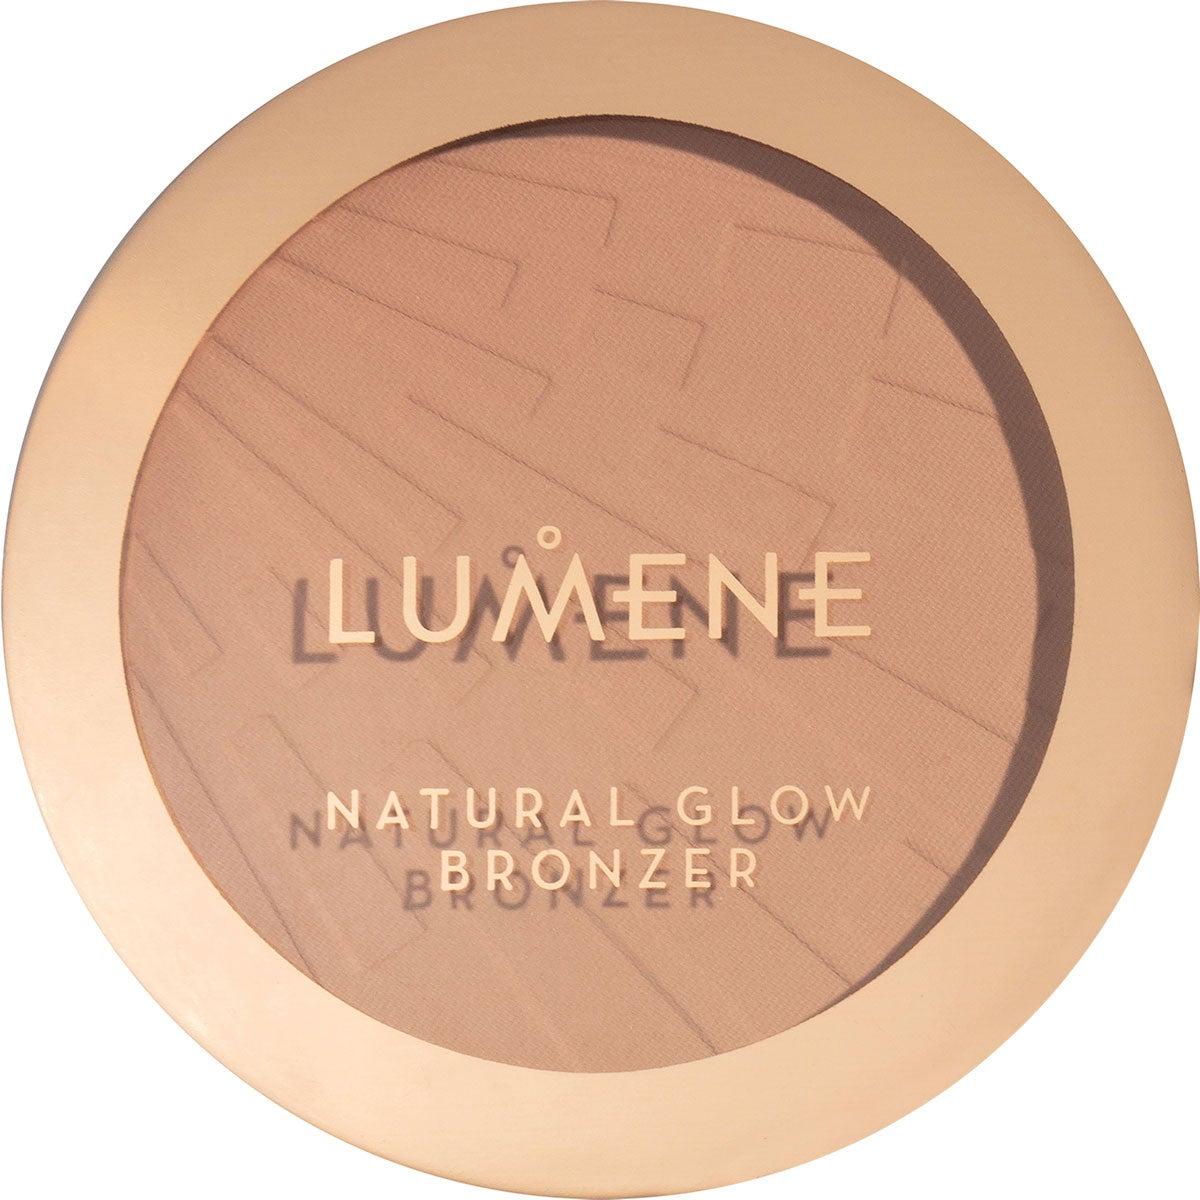 Nordic Glow Bronzer,  Lumene Bronzer